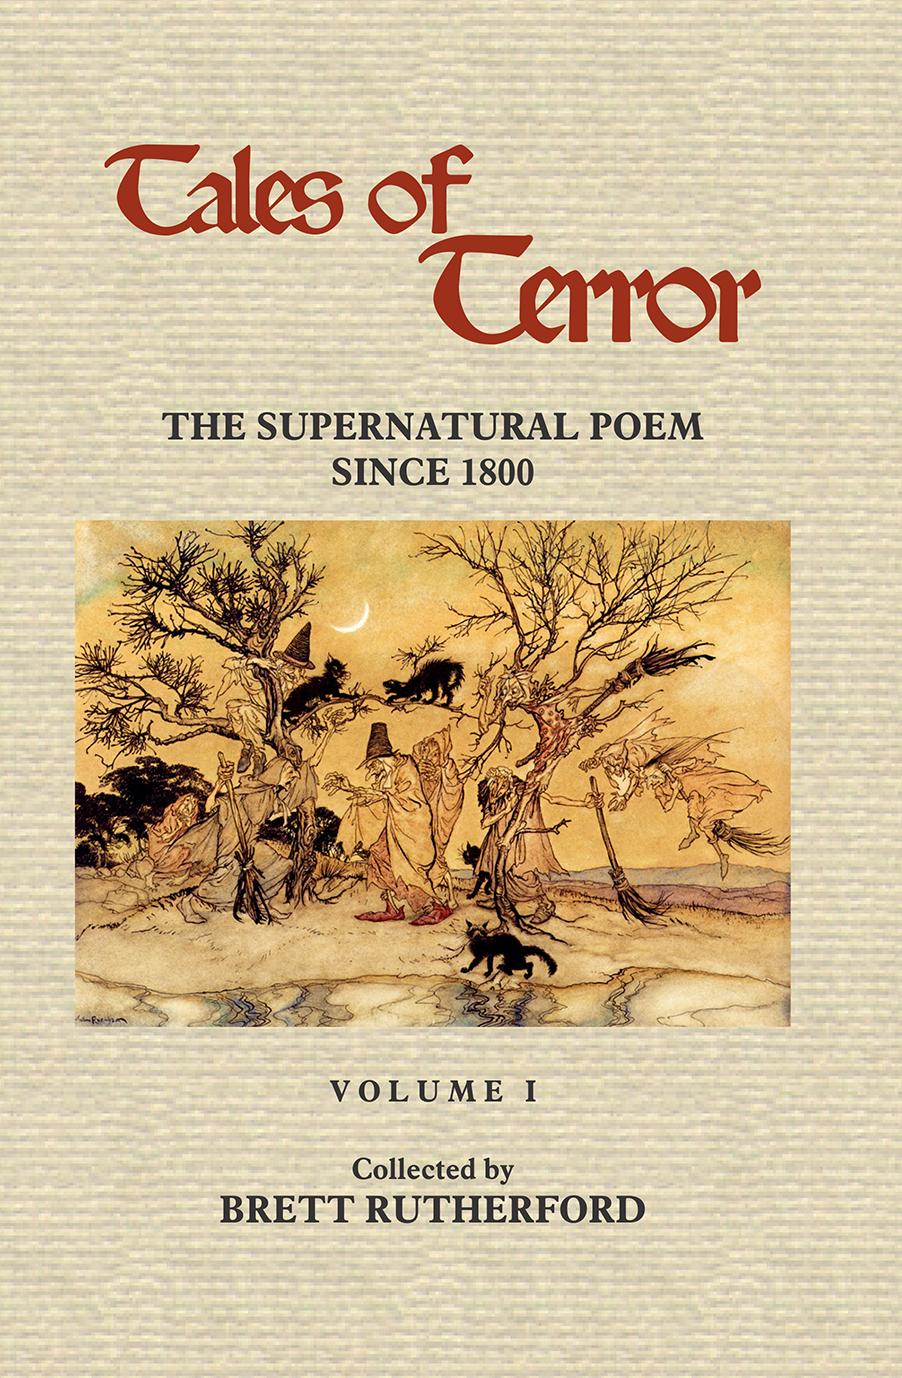 Tales Of Terror: The Supernatural Poem Since 1800, Volume 1 (pdf)